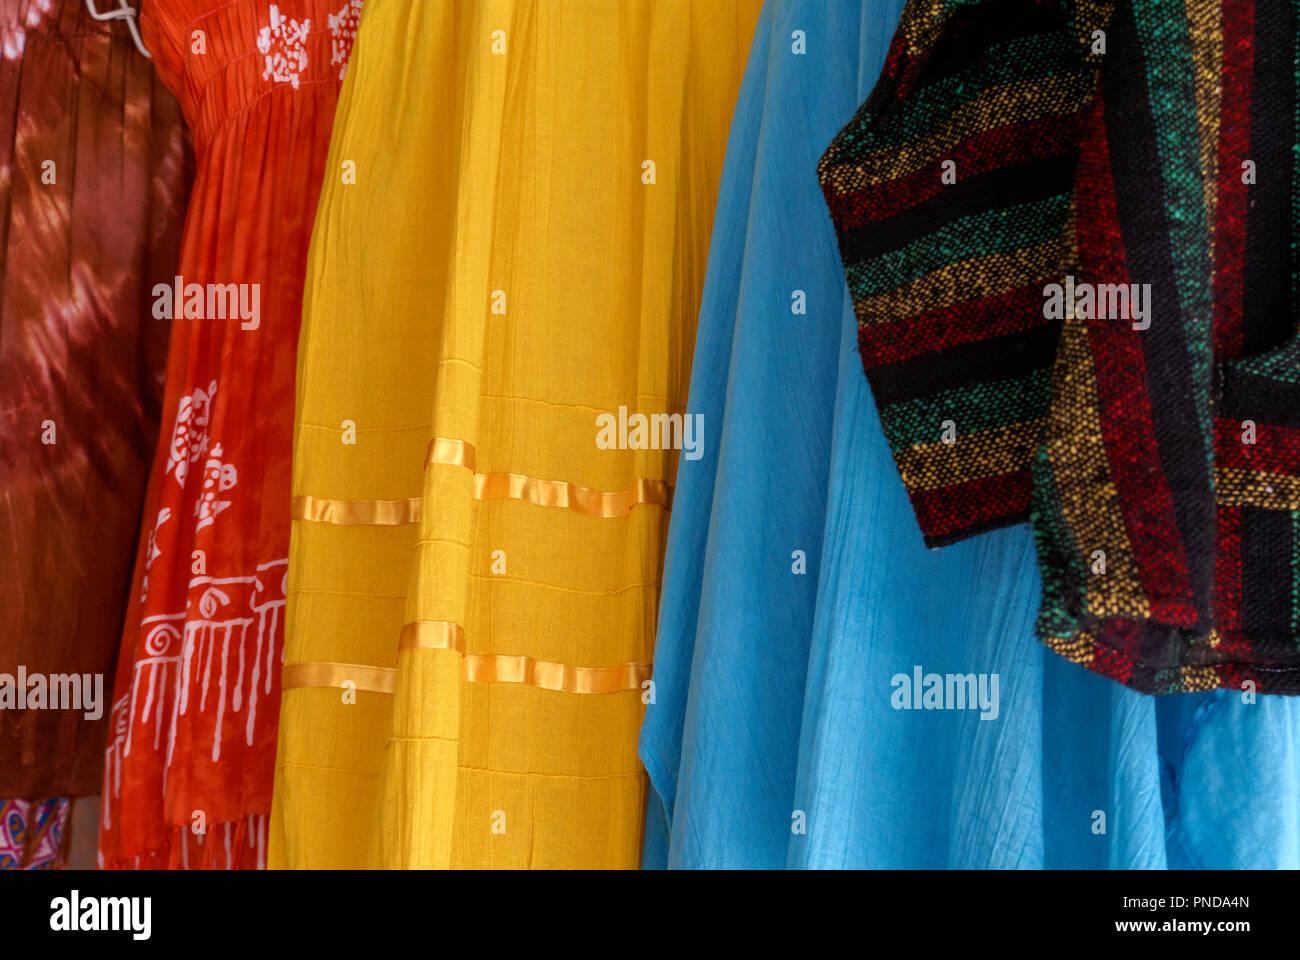 Colorful women's dresses and skirts for sale in in the Mercado Pino Suarez Market,  Mazatlan, Sinaloa, Mexico - Stock Image